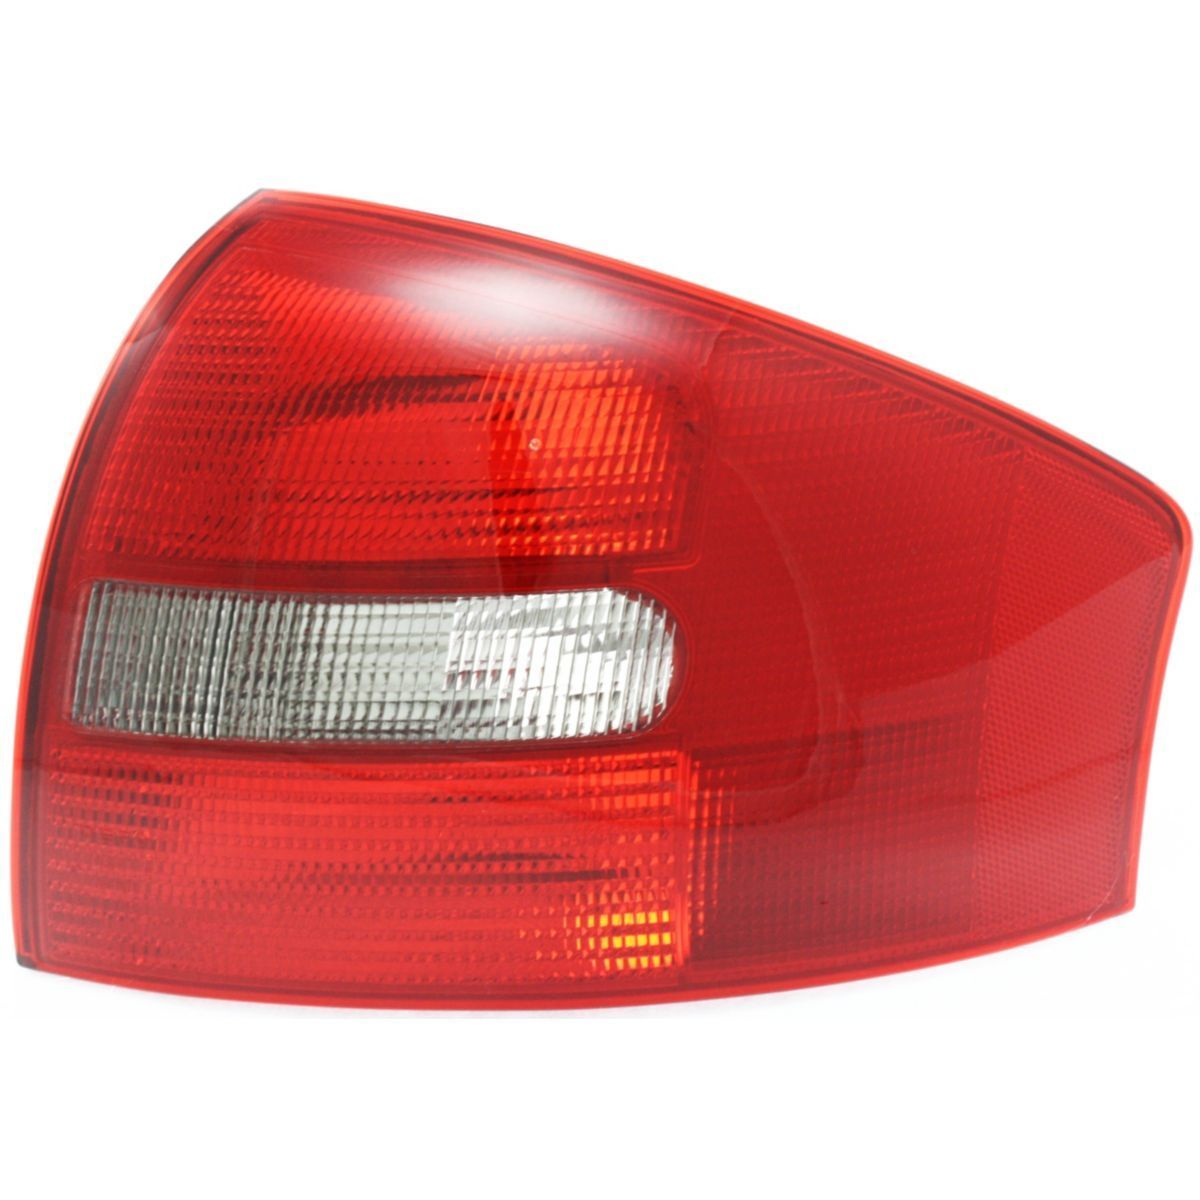 hight resolution of  b new tail light assembly passenger side fits 1998 2001 audi a6 sedan au2819109 4b5945096a b walmart com